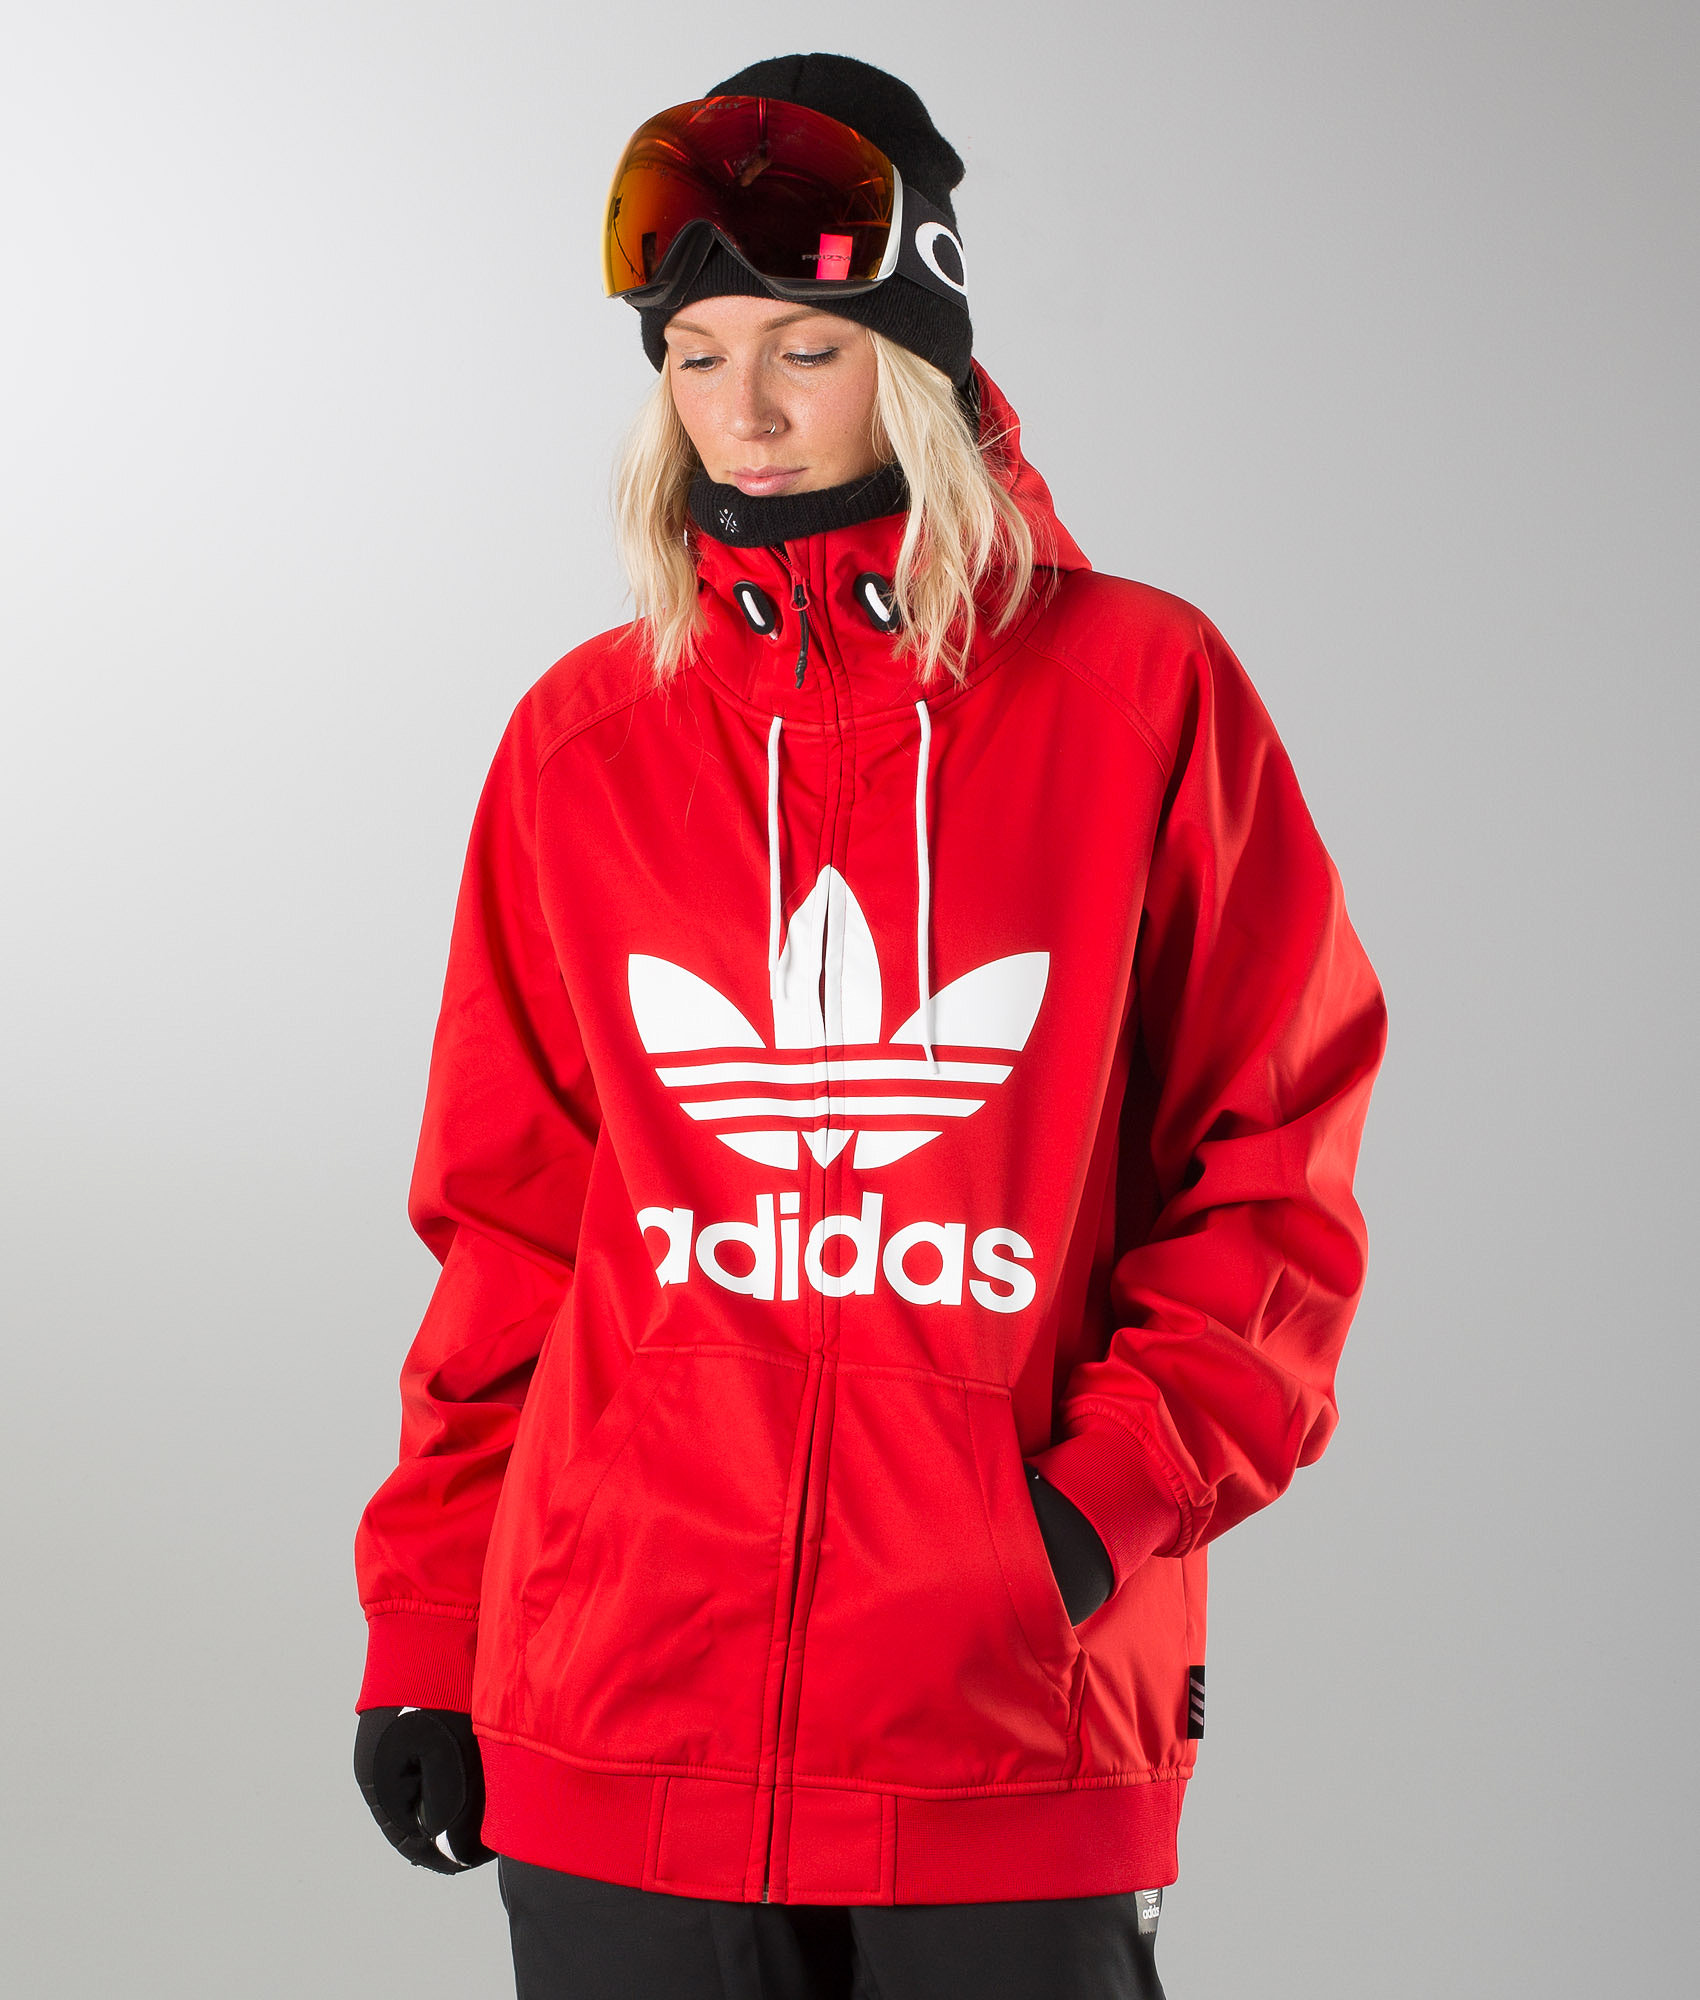 Adidas Snowboarding Greeley Unisex Snowboardjacke Scarlet White ... a8bea08fd2